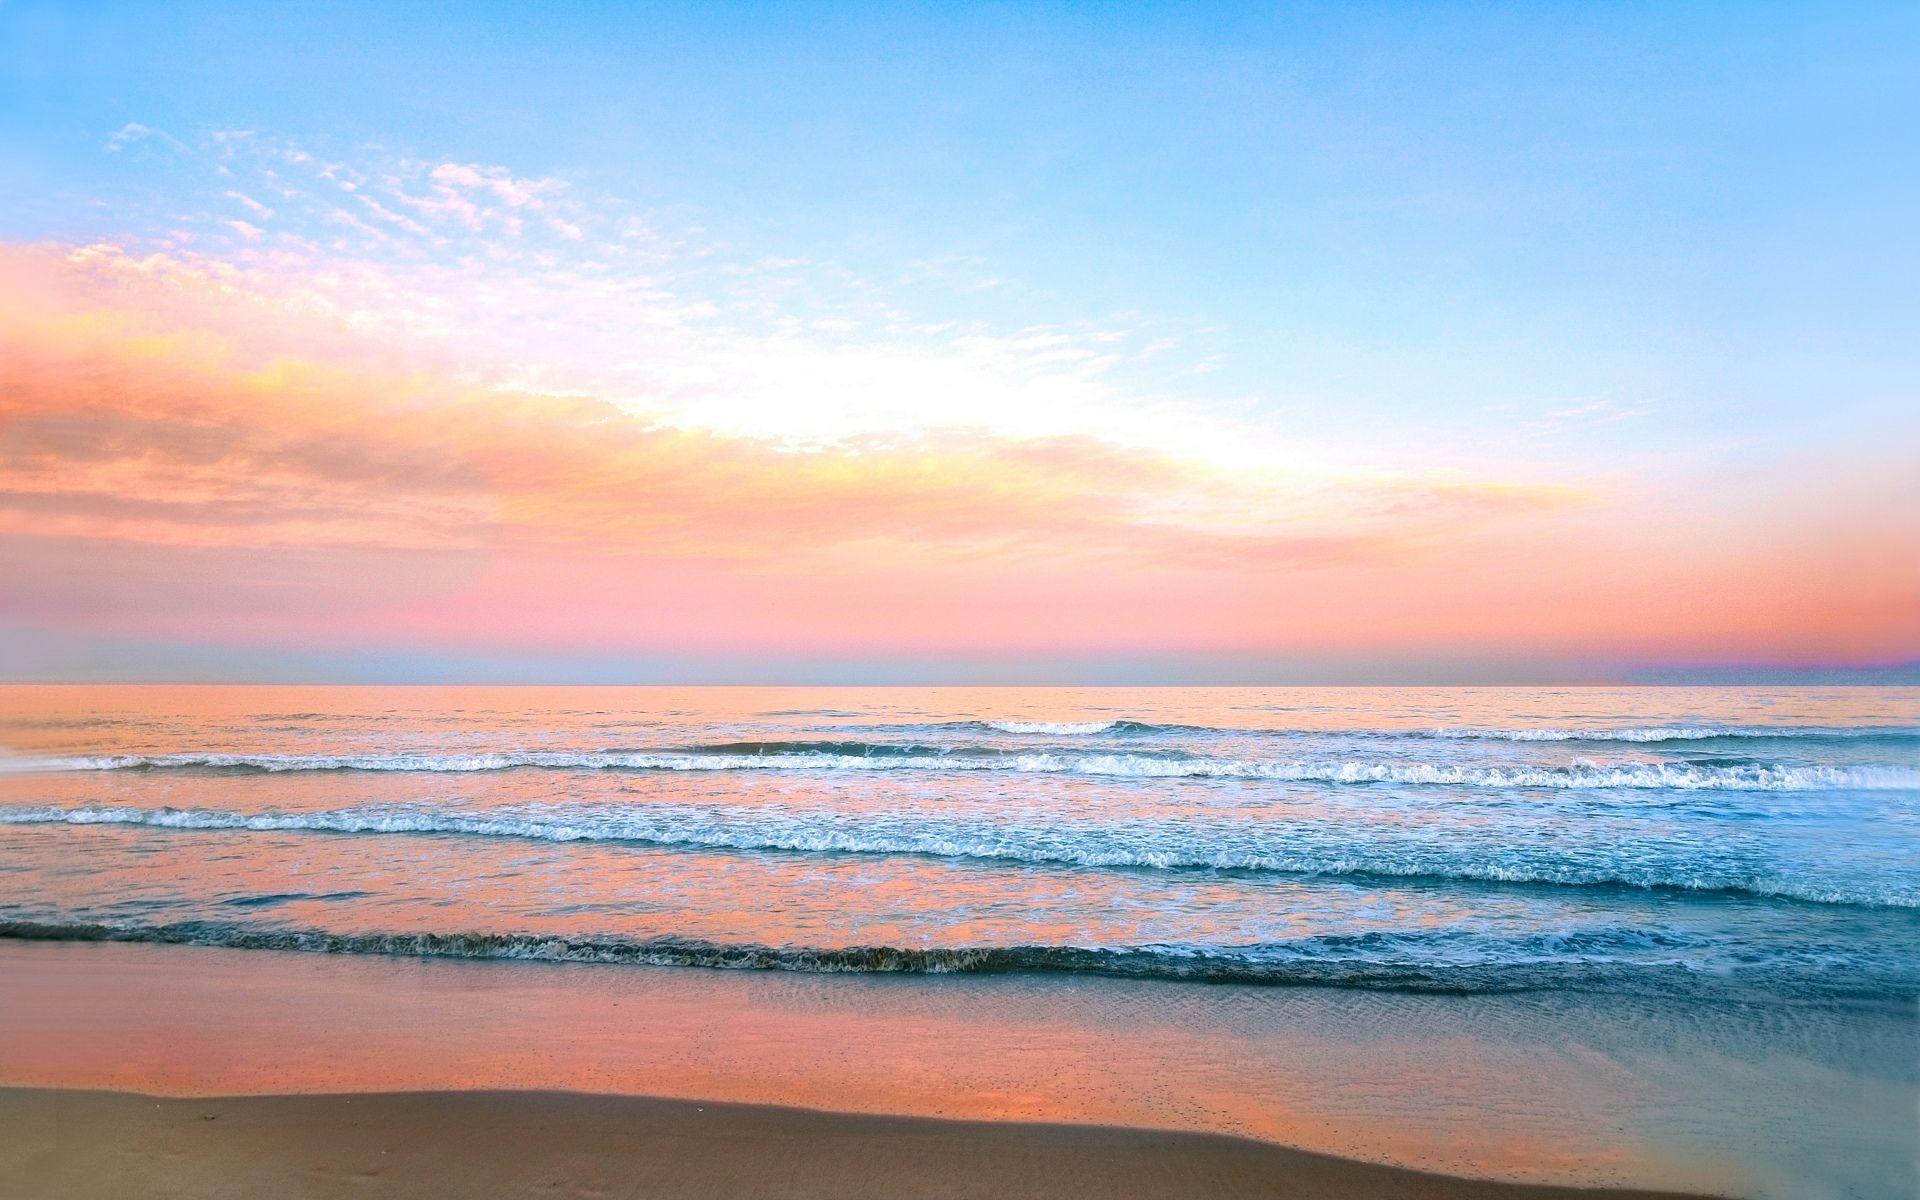 Scenery Wallpaper For Bedroom Earth Scenic Cloud Orange Pink Sea Beach Sky Nature Pastel Horizon